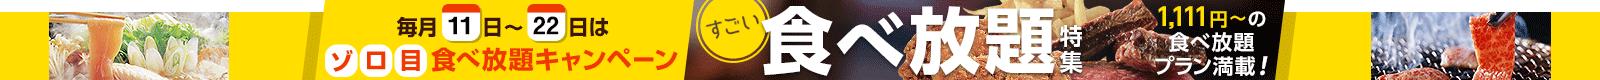 Yahoo!予約で1111円など信じられないセール価格でゾロ目食べ放題が予約開始。土間土間、安安、木村屋本店、串カツ田中、温野菜など。